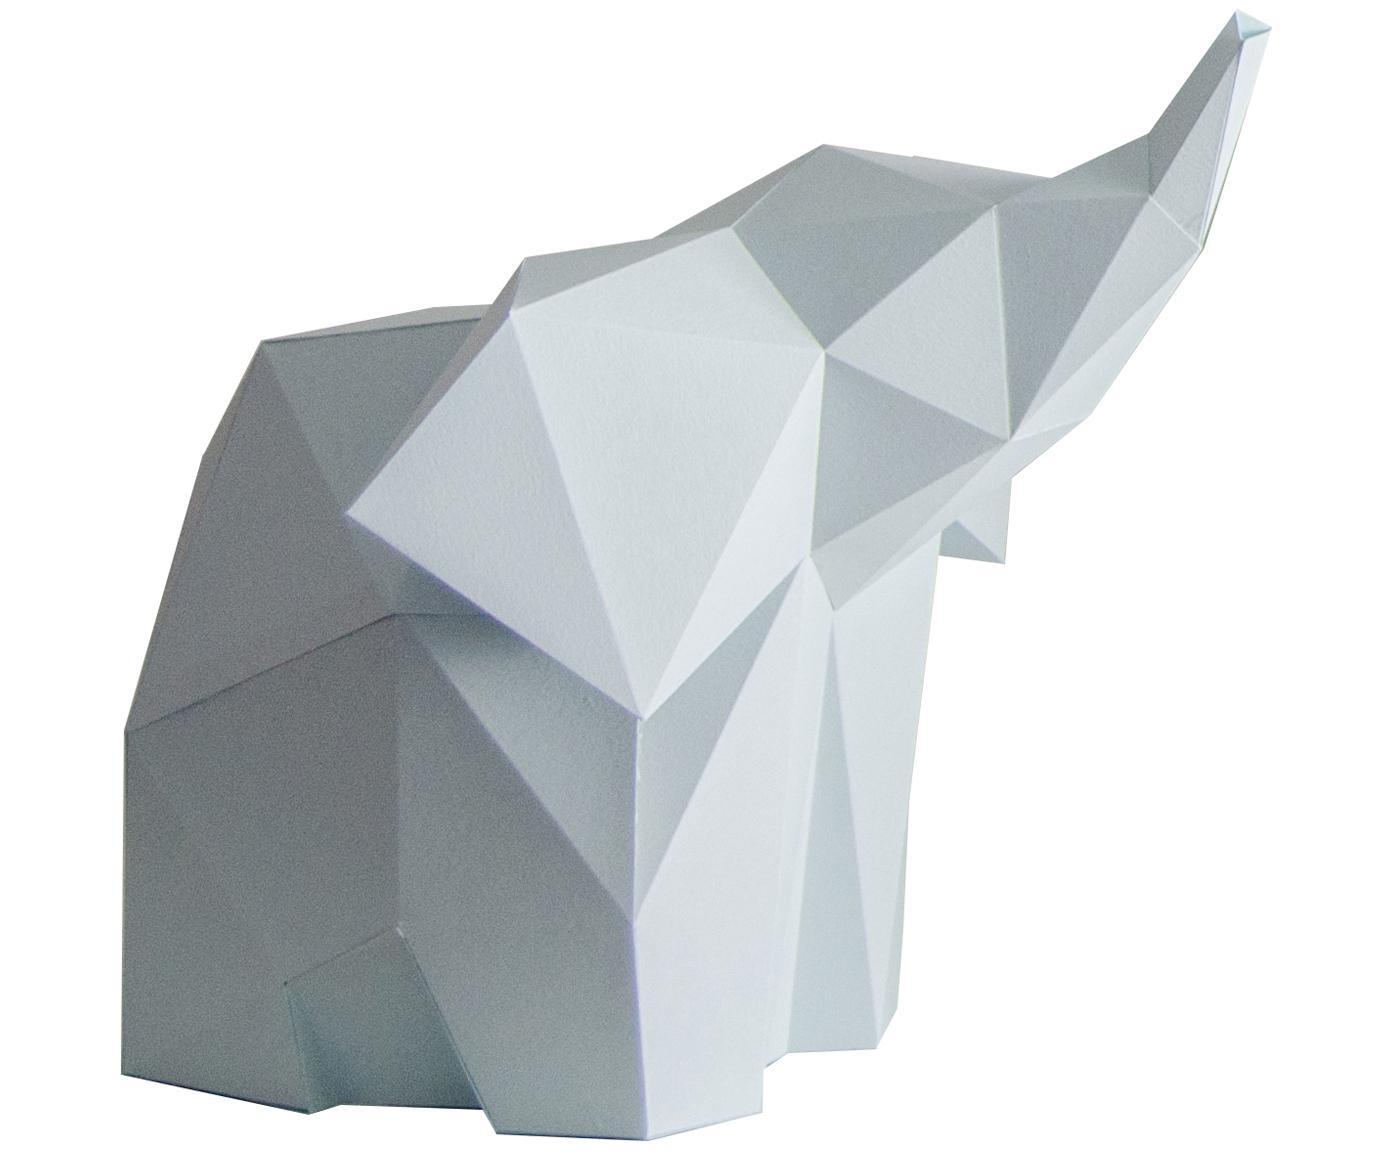 Tafellamp Baby Elephant, bouwpakket van papier, Lampenkap: papier, 160 g/m², Fitting: MDF, kunststof, Lichtblauw, 23 x 24 cm